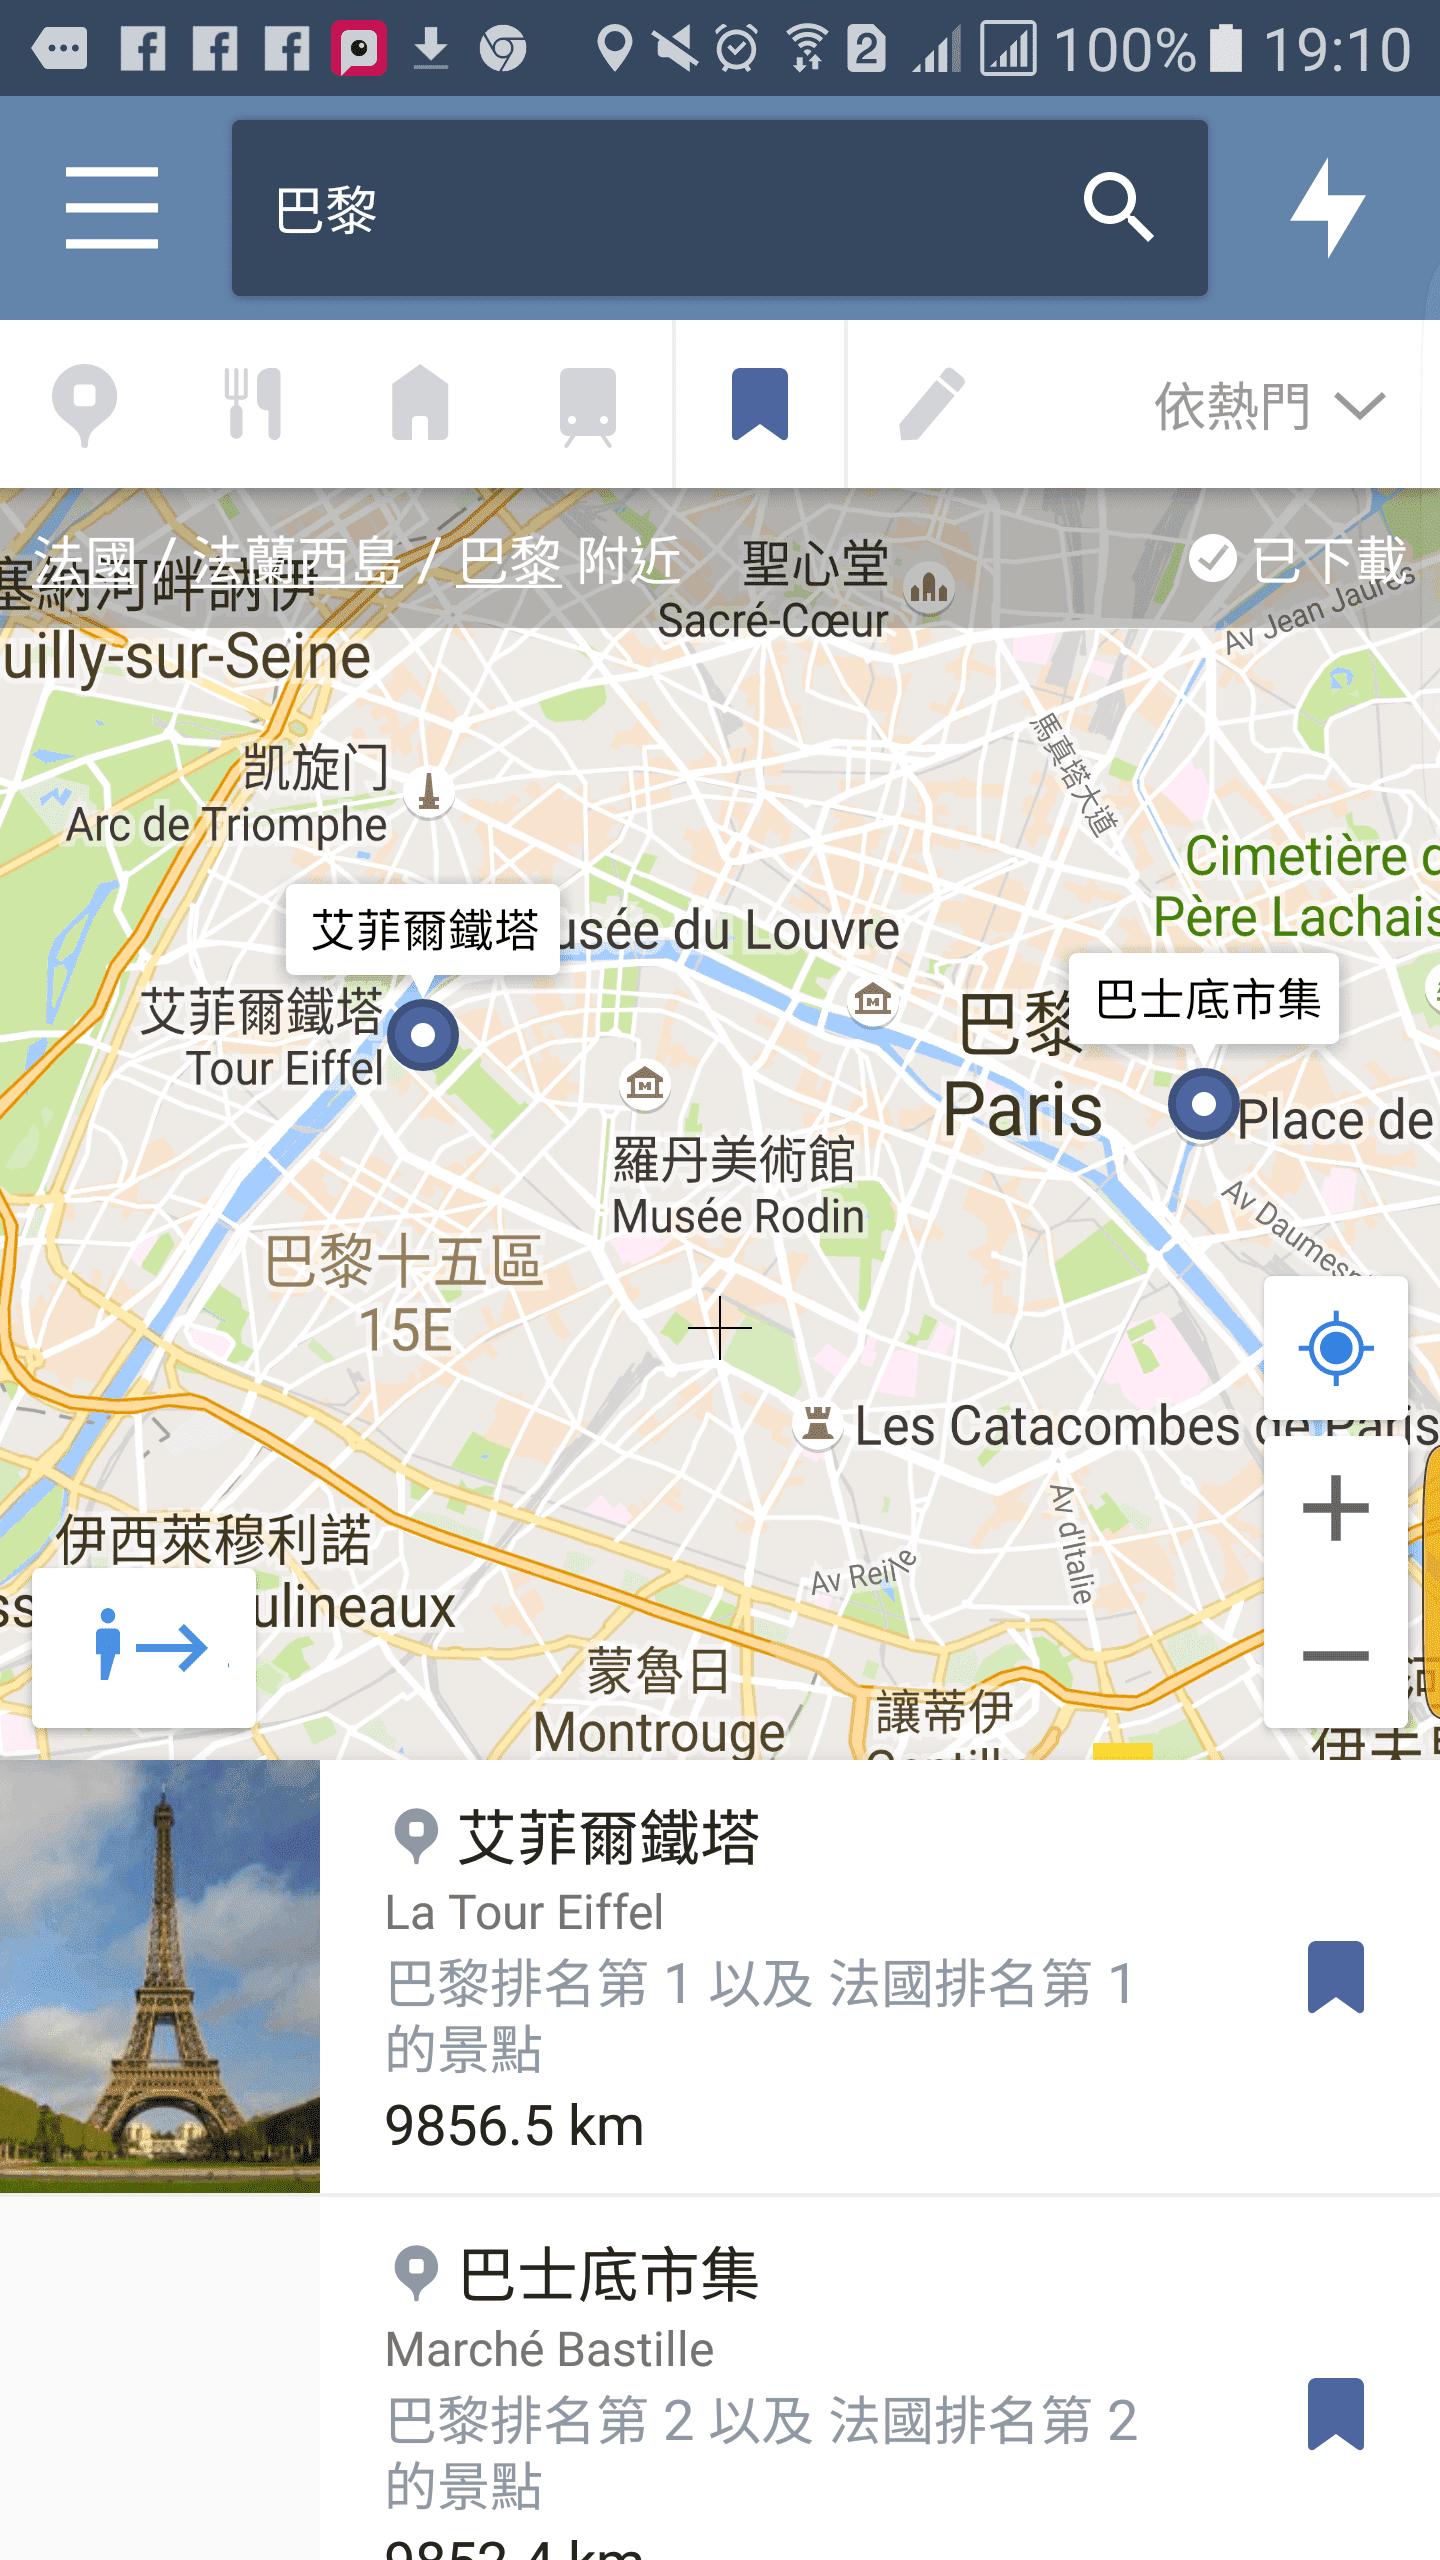 screenshot_20161203-191008